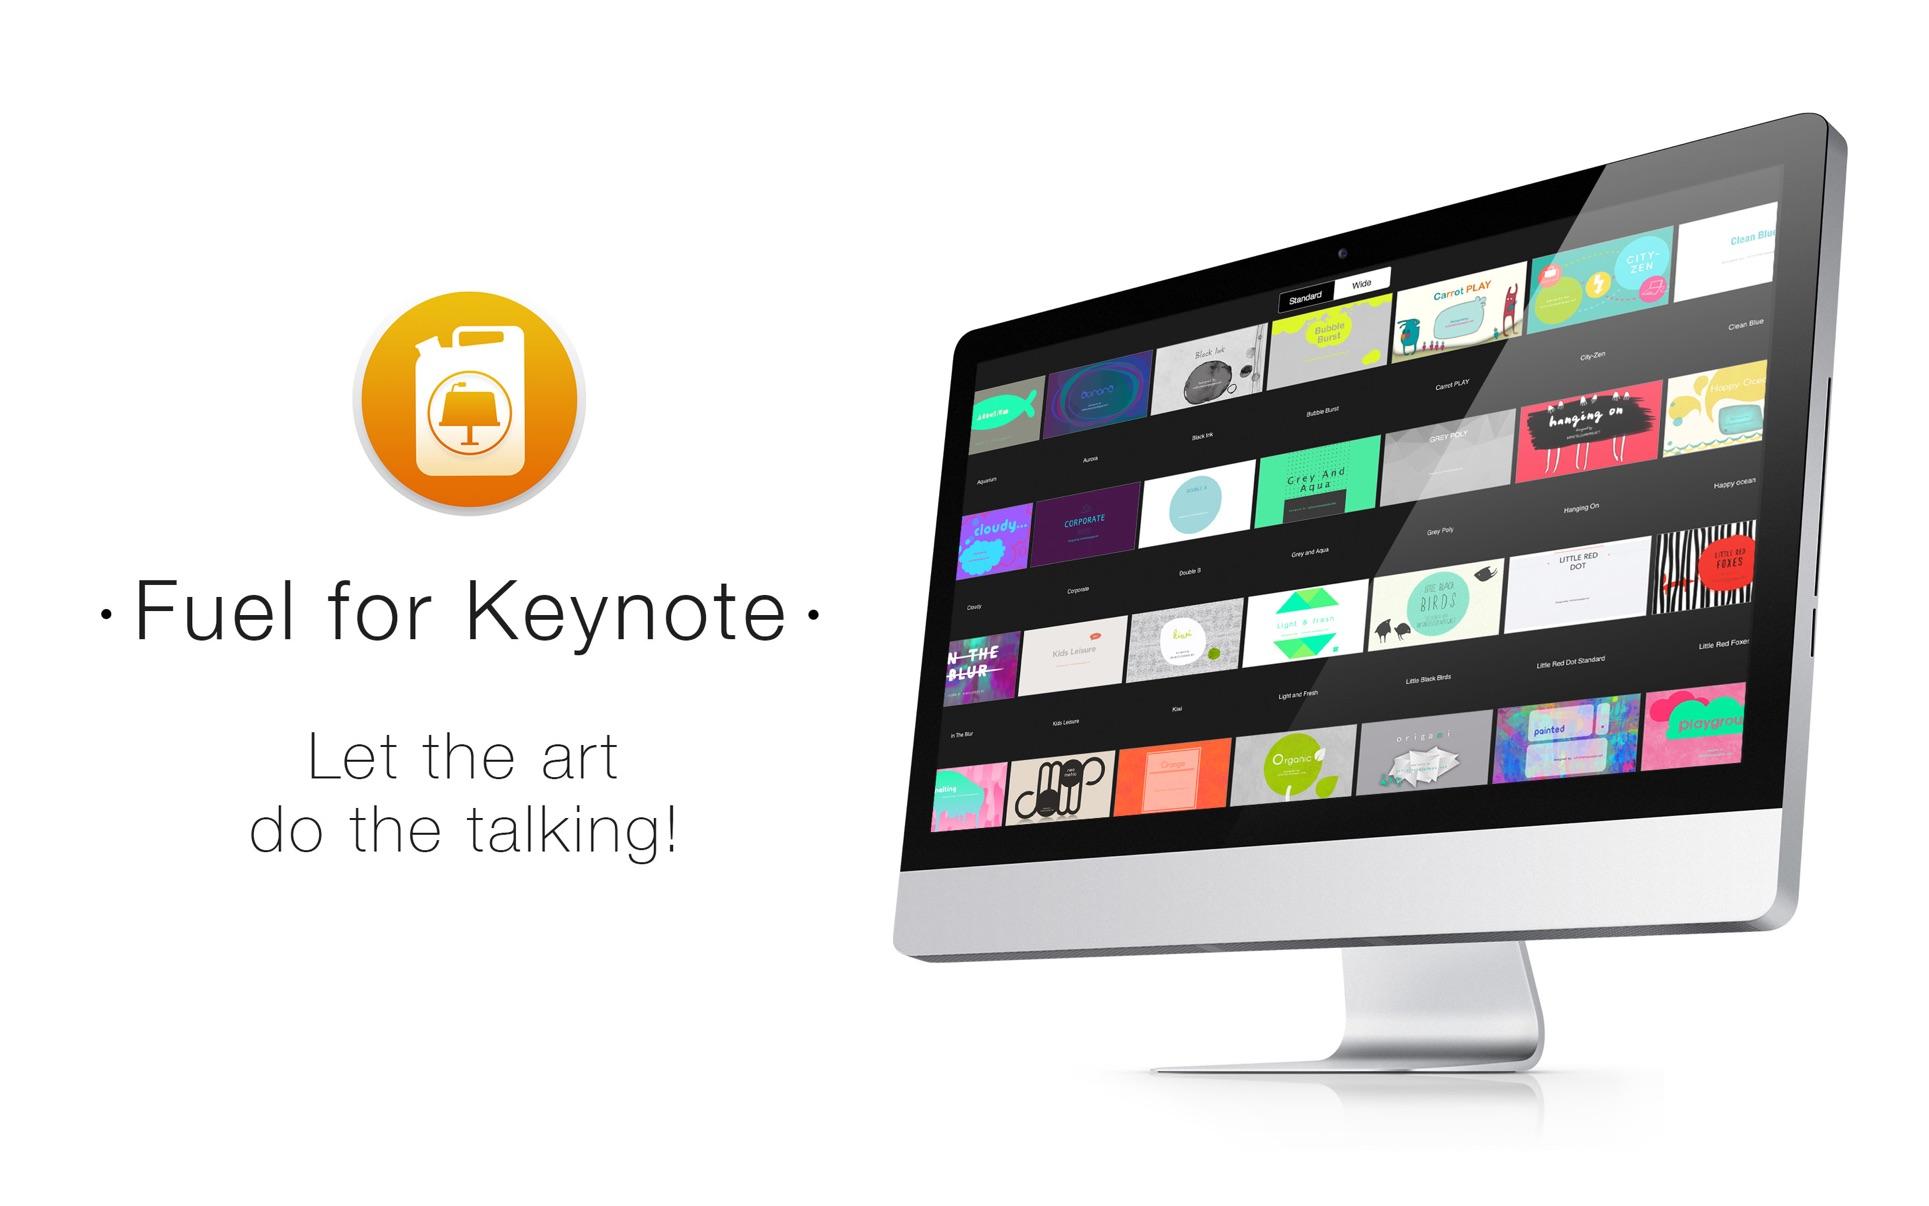 Fuel for Keynote Mac 破解版 Mac上精美的Keynote模板合集-麦氪搜(iMacso.com)